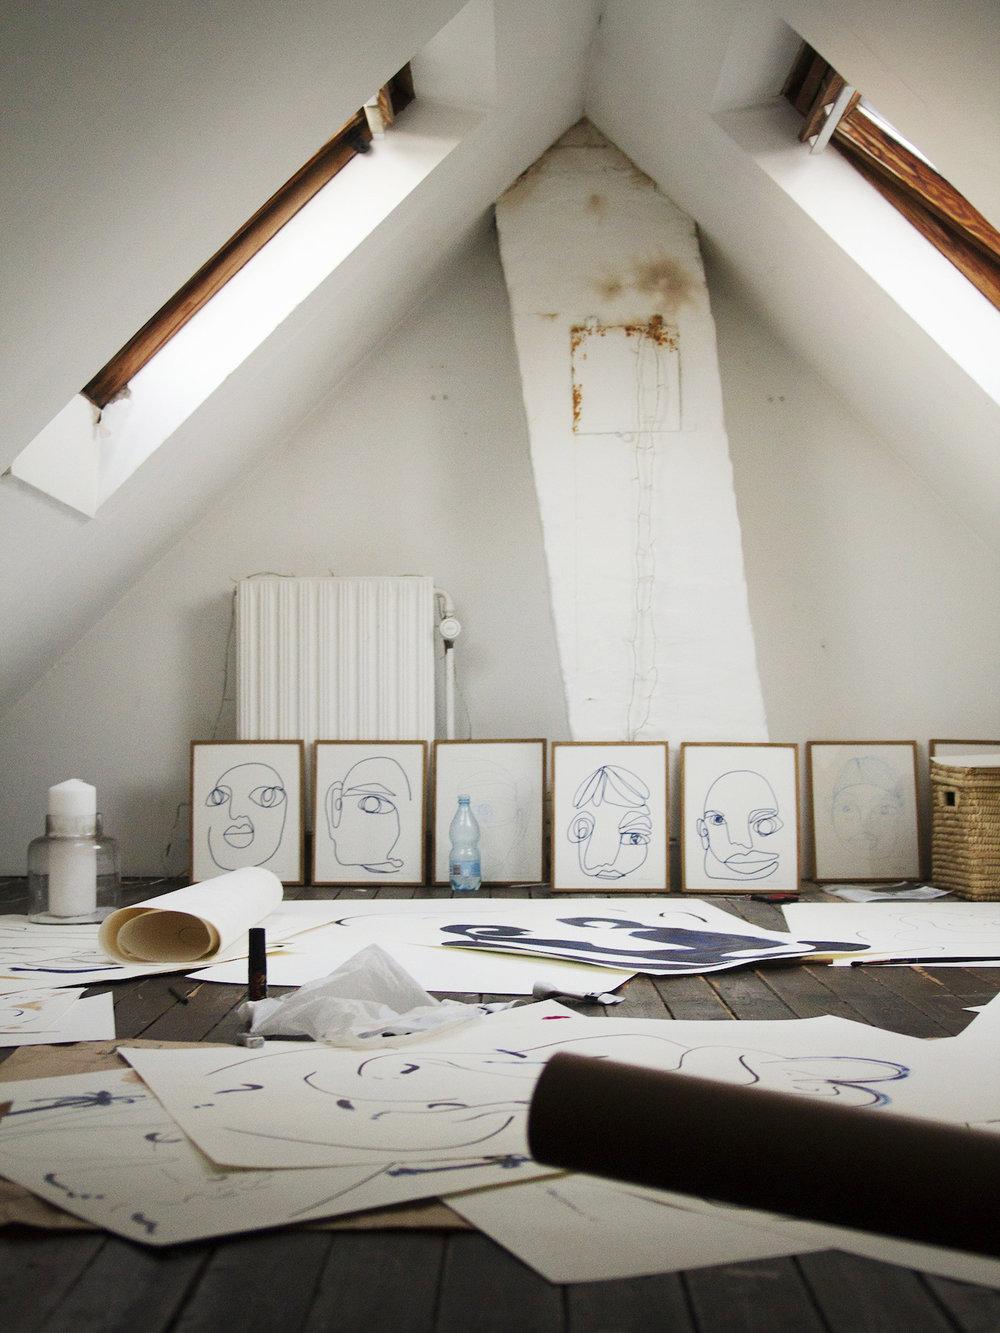 Christiane Spangsberg's studio | Photo by Louise Thornfeldt.